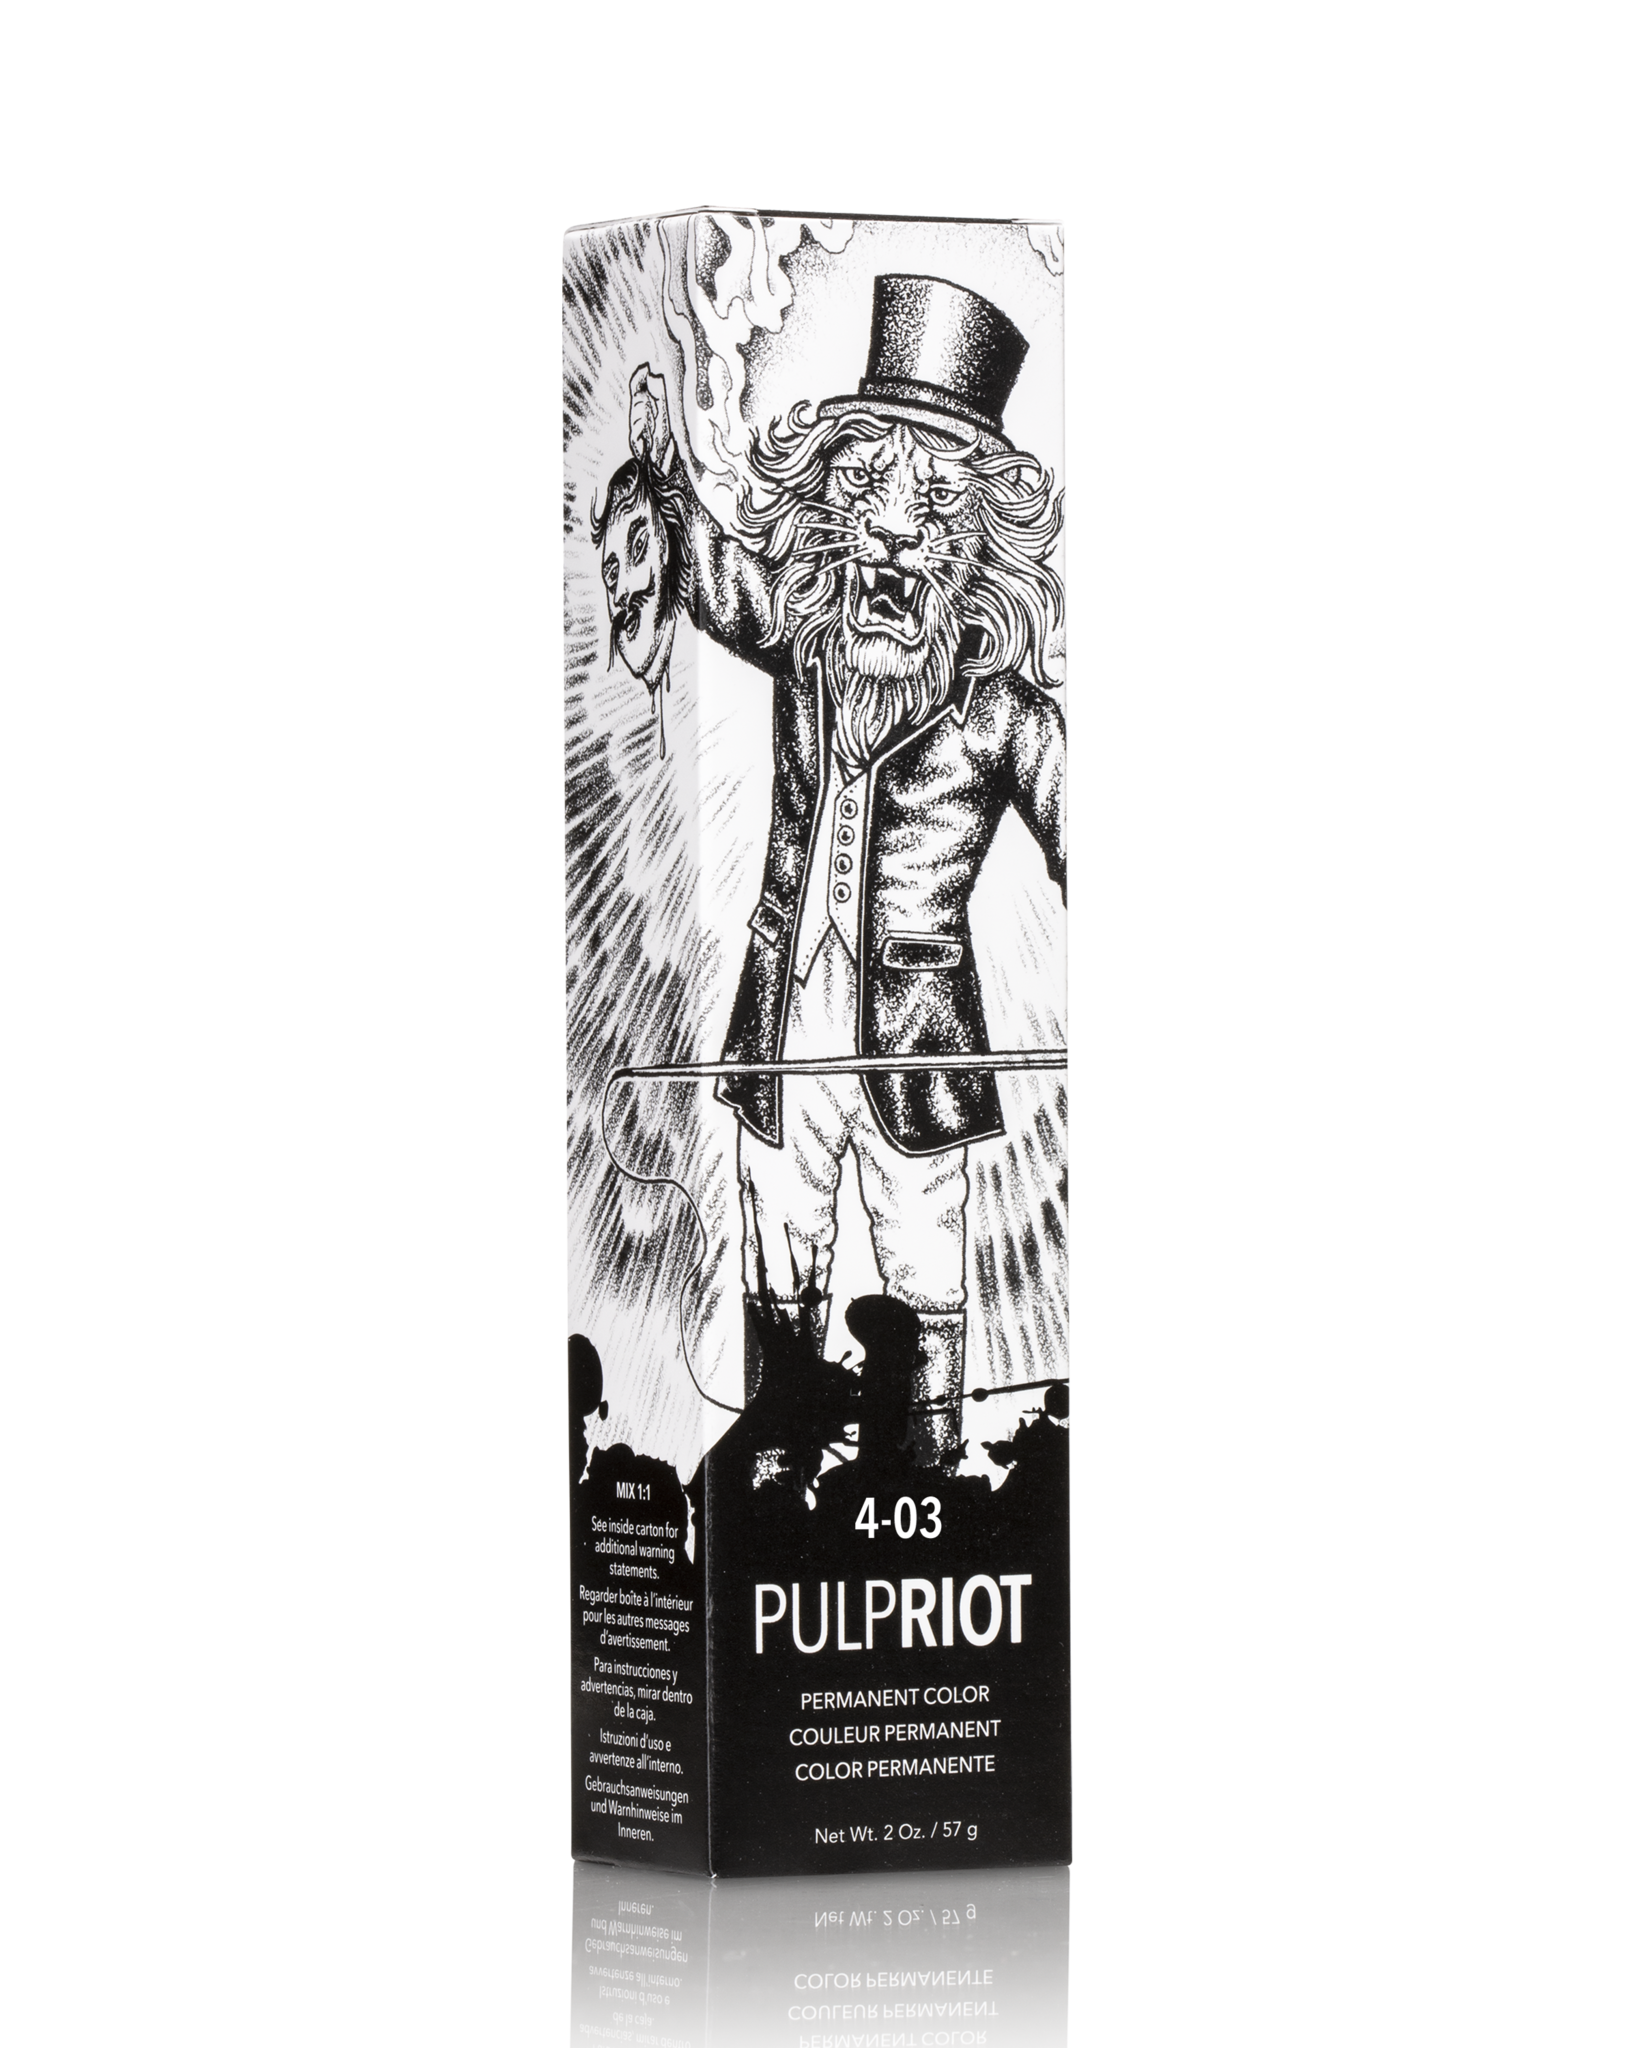 Pulp Riot PULP RIOT FACTION 8 NATUREL DORÉ/NATUREL GOLD 4-03